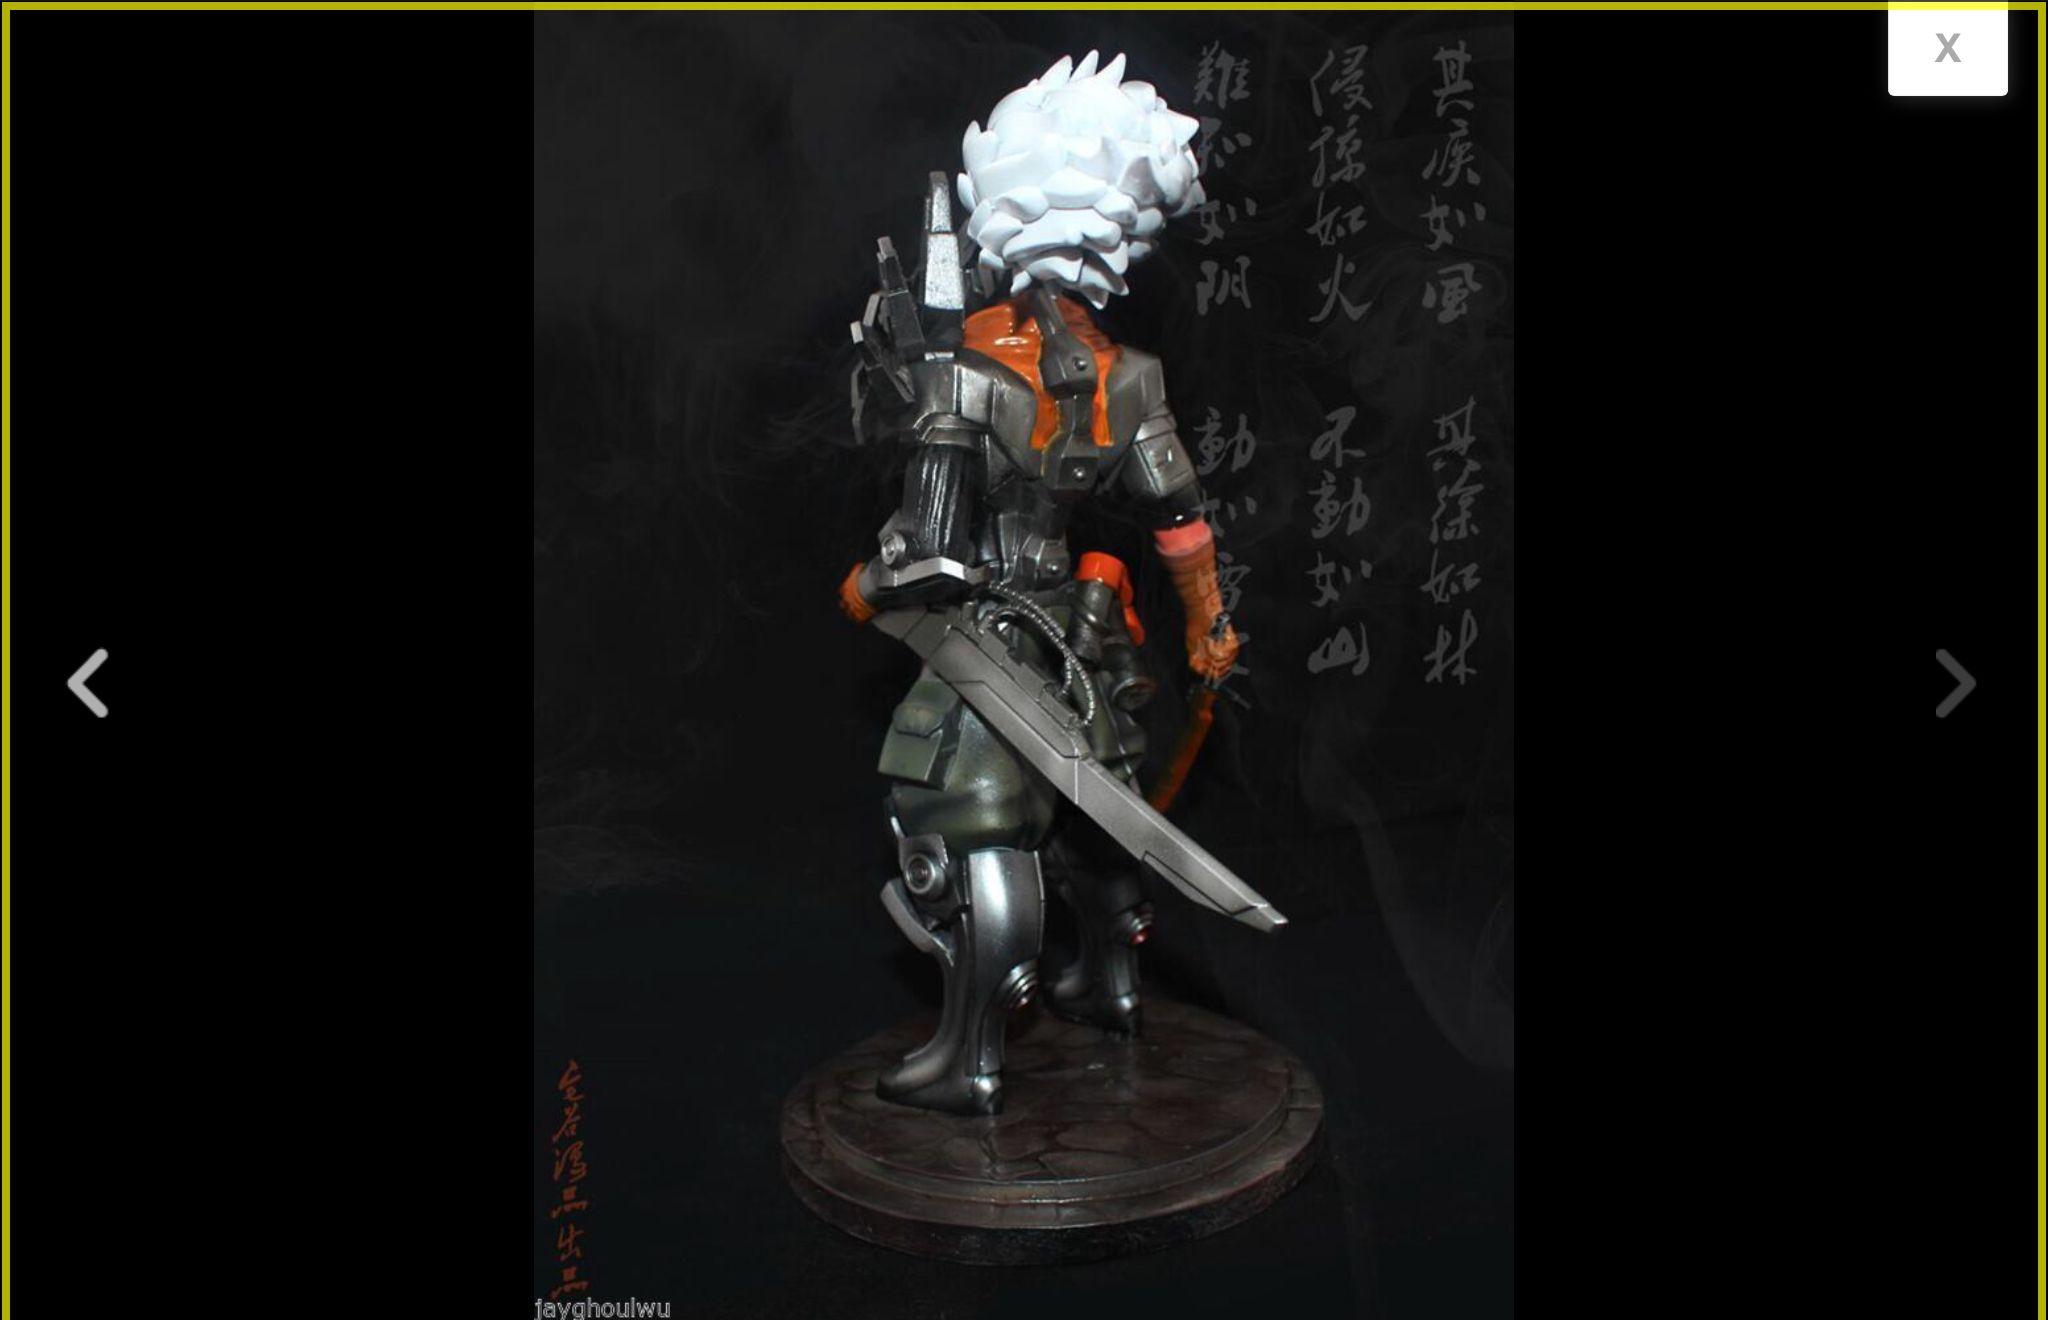 1 6 LOL League of Legends The Project Yasuo The Unforgiven Yasuo Handwork Figure | eBay